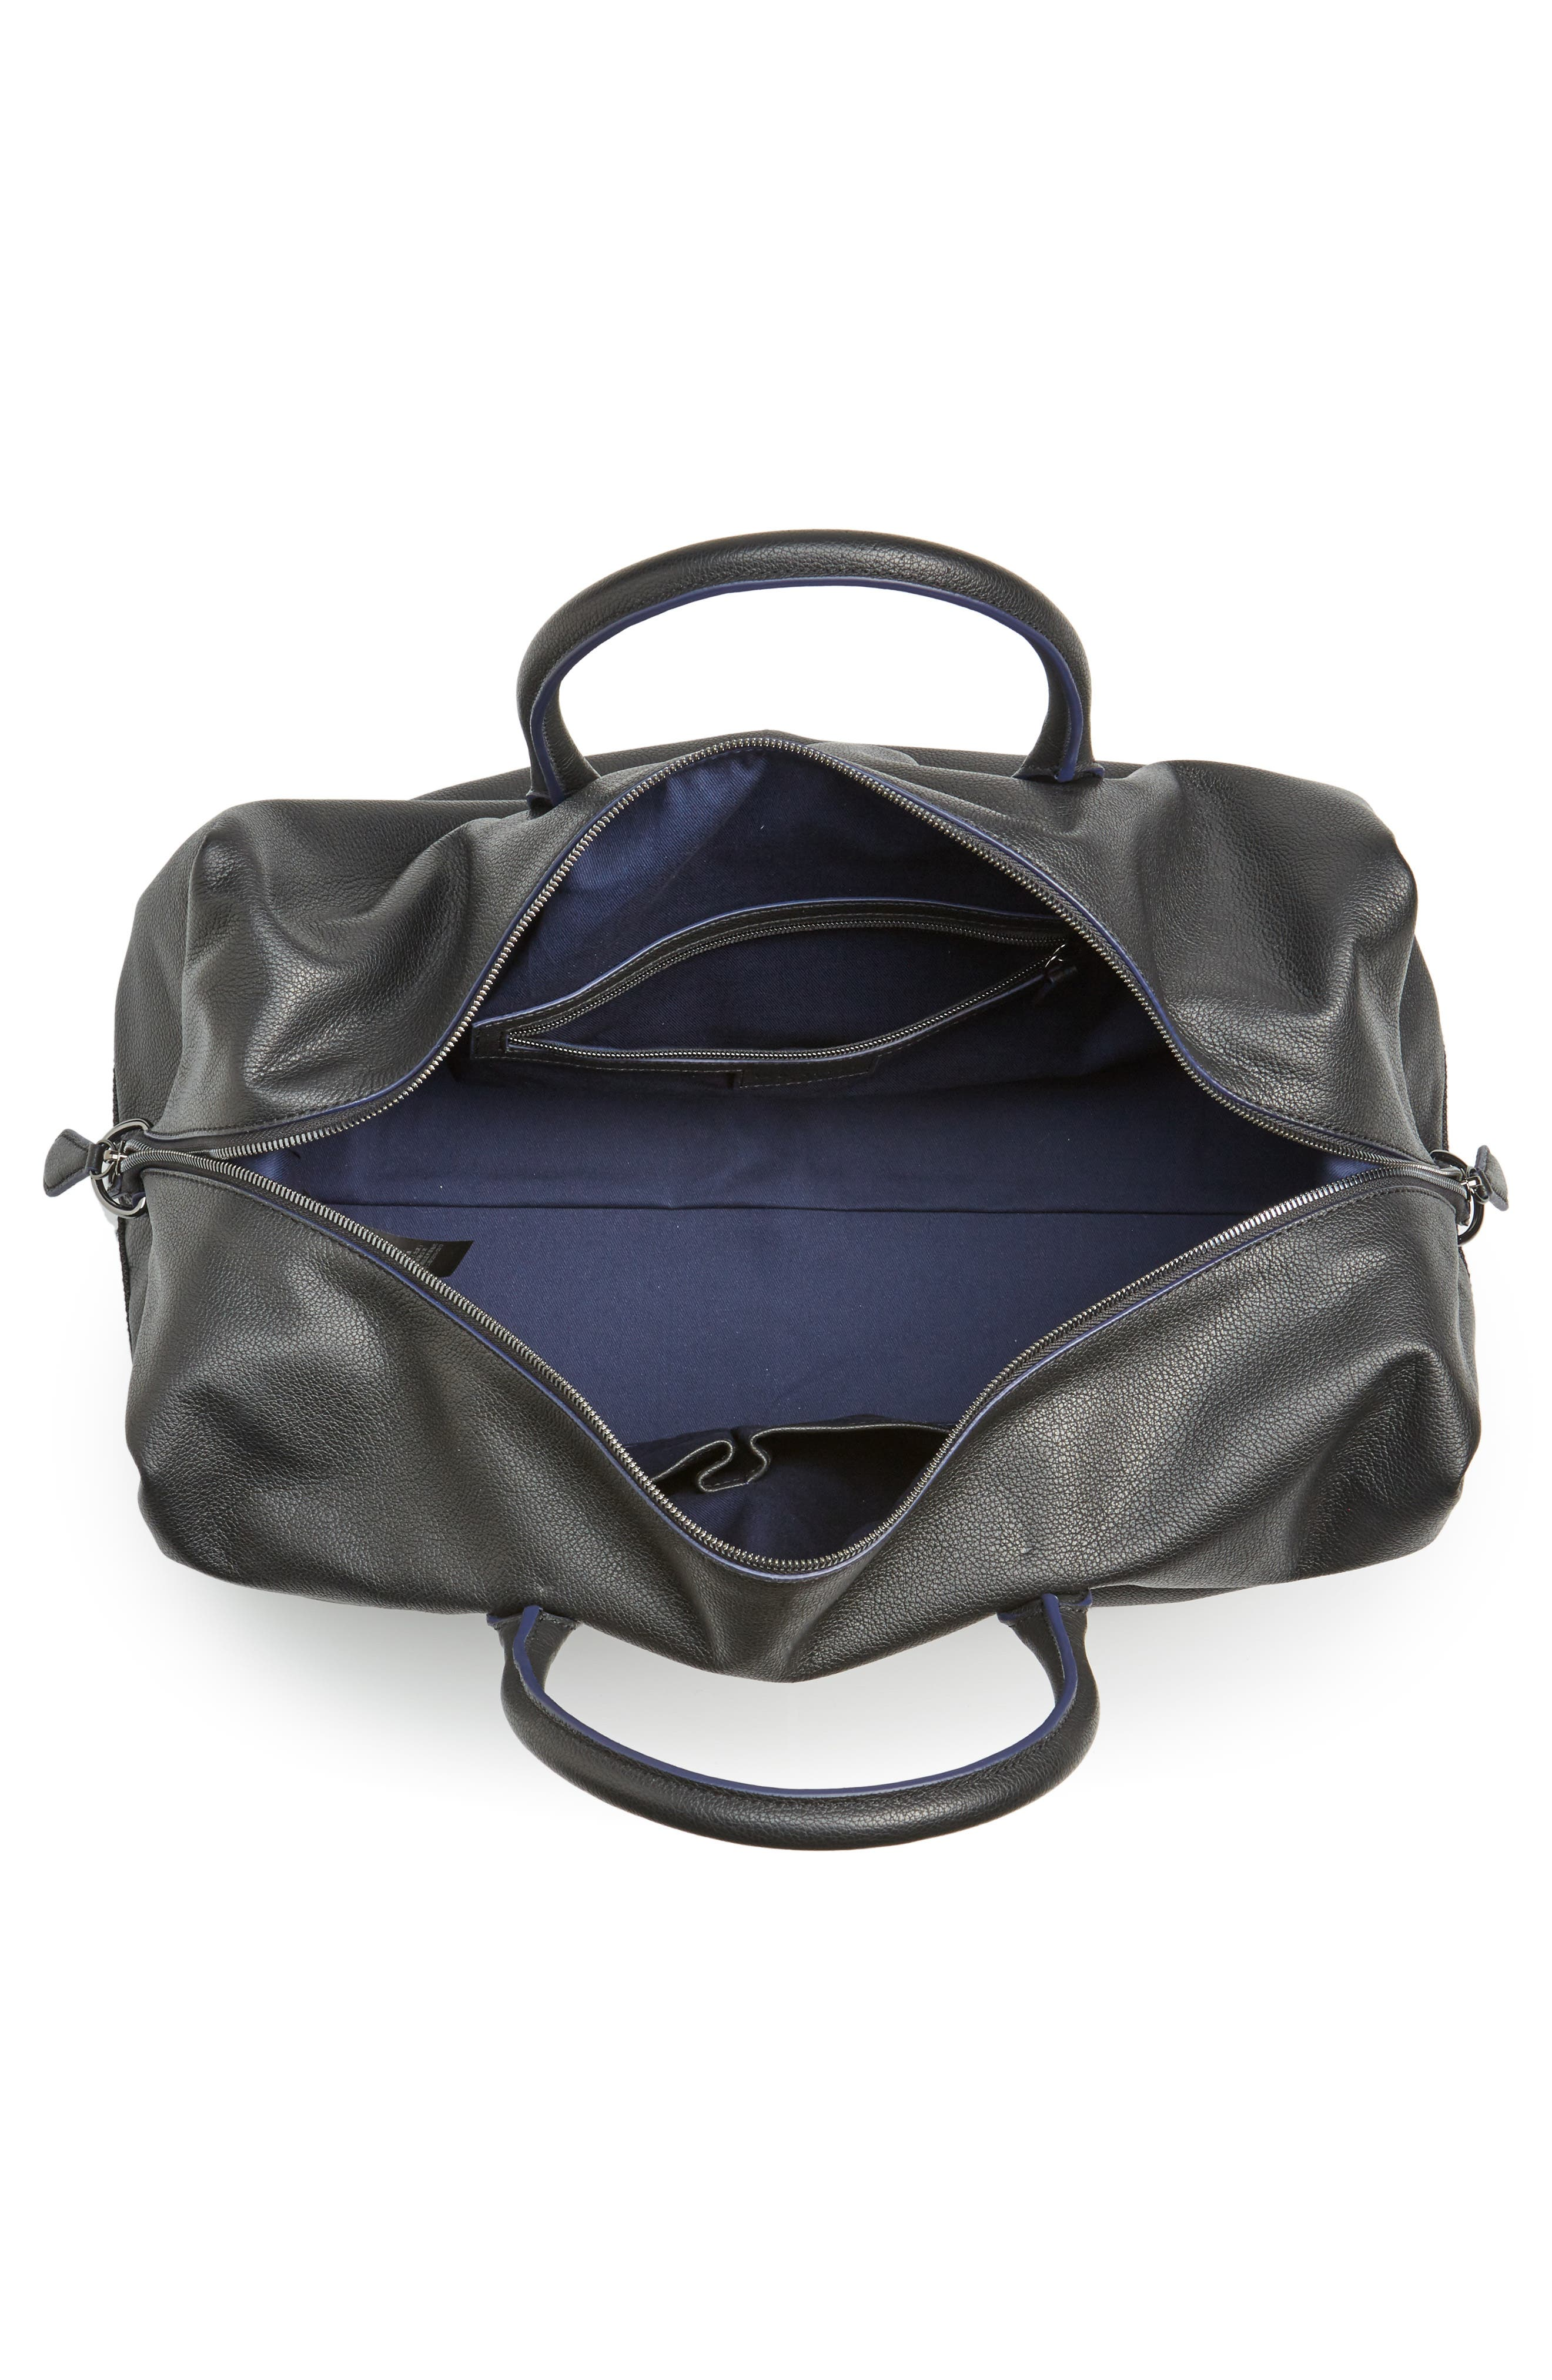 Mylow Duffel Bag,                             Alternate thumbnail 4, color,                             BLACK